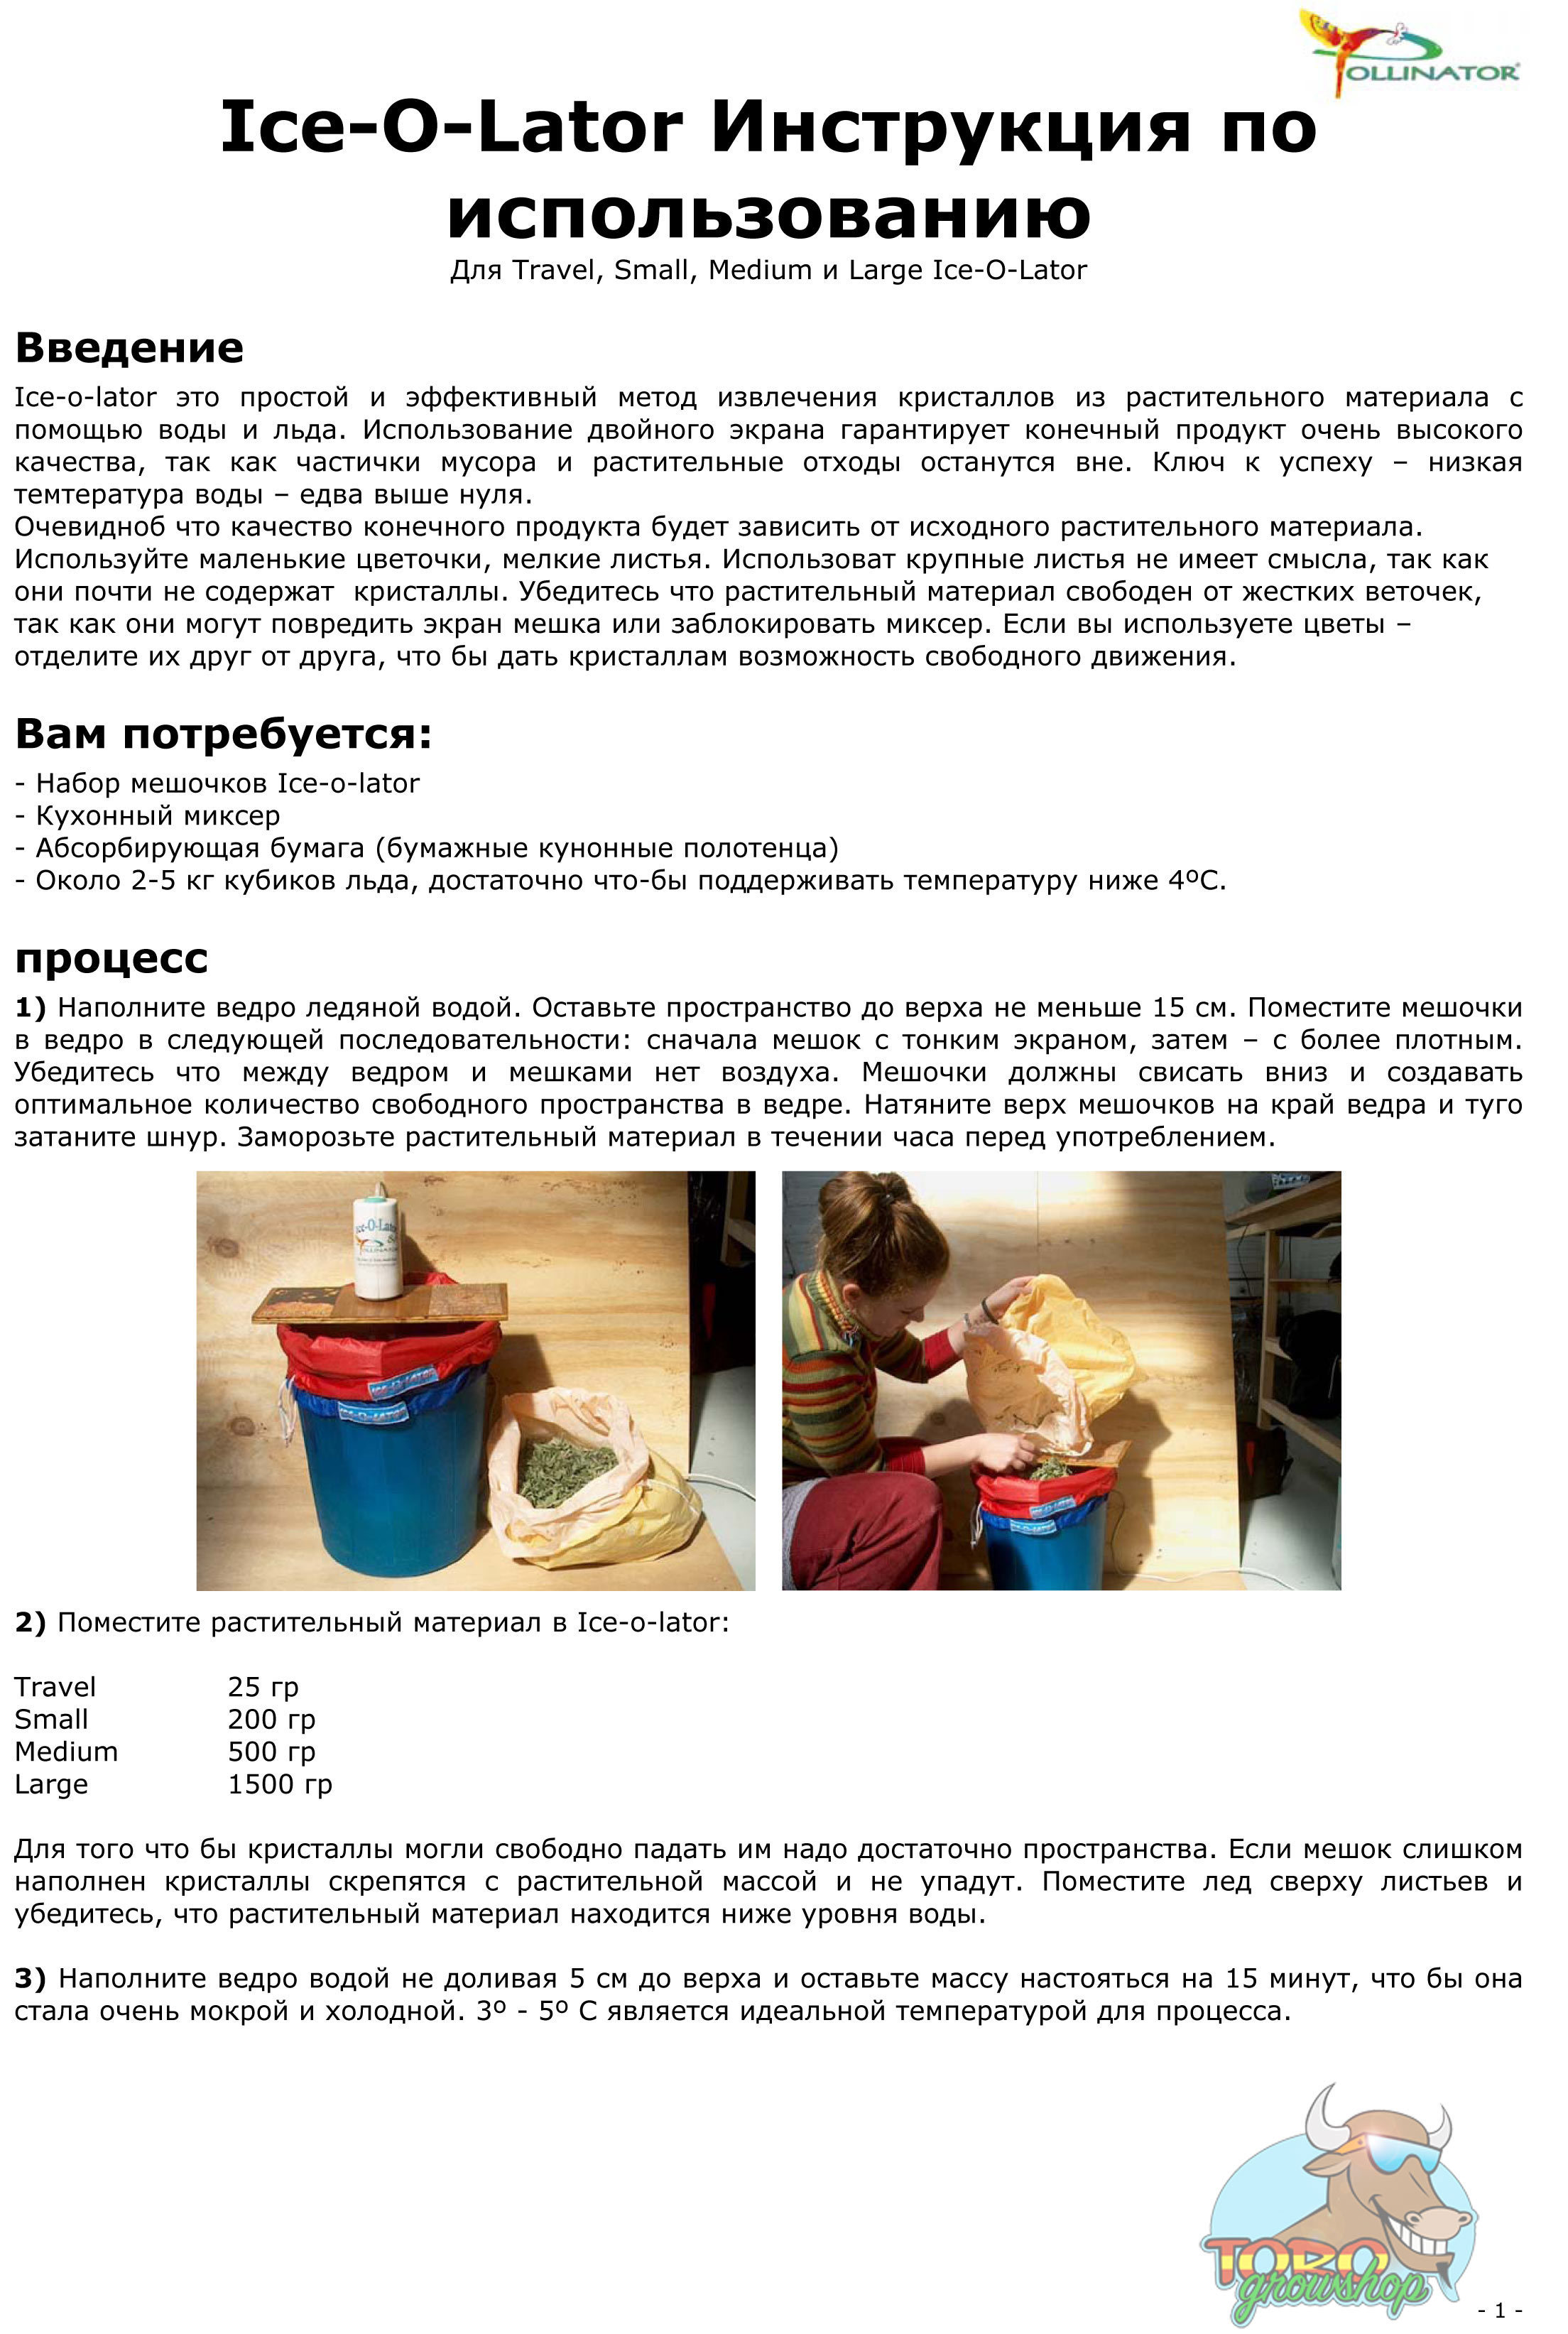 Ice-O-Lator походный Indoor Set (2 мешка/220-70 микрон)